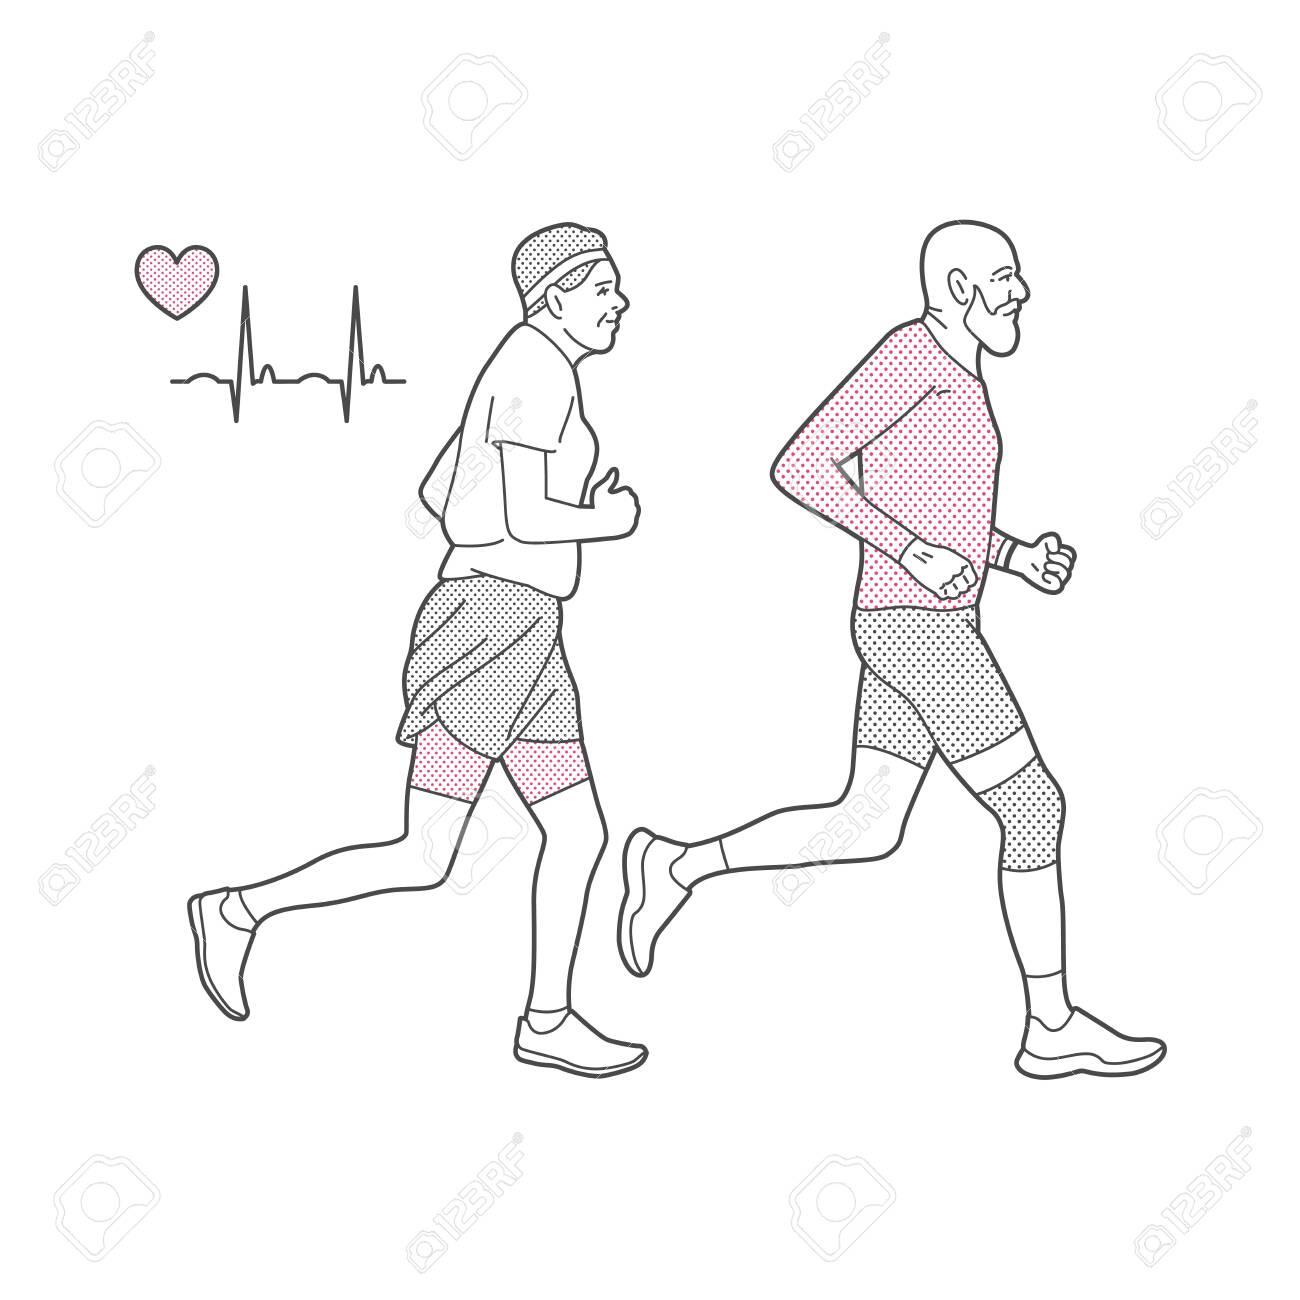 Vector illustration on the theme of running. - 142695203